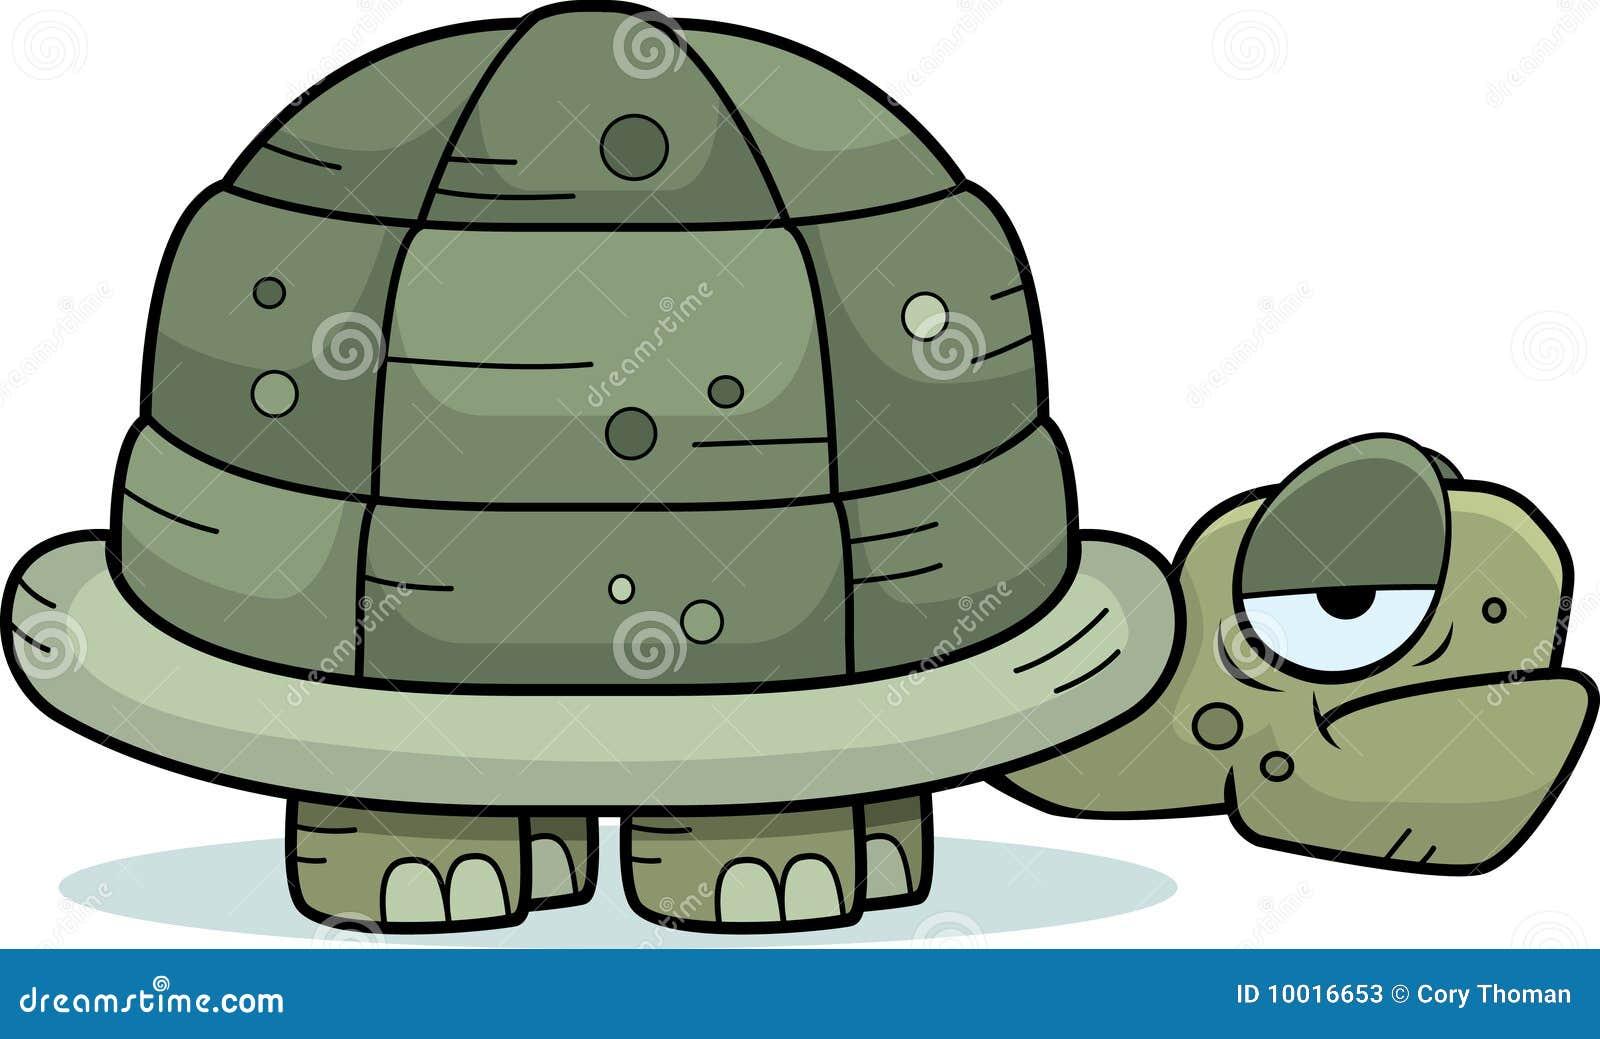 Turtle Clip Art - Turtle Clipart, HD Png Download , Transparent Png Image -  PNGitem